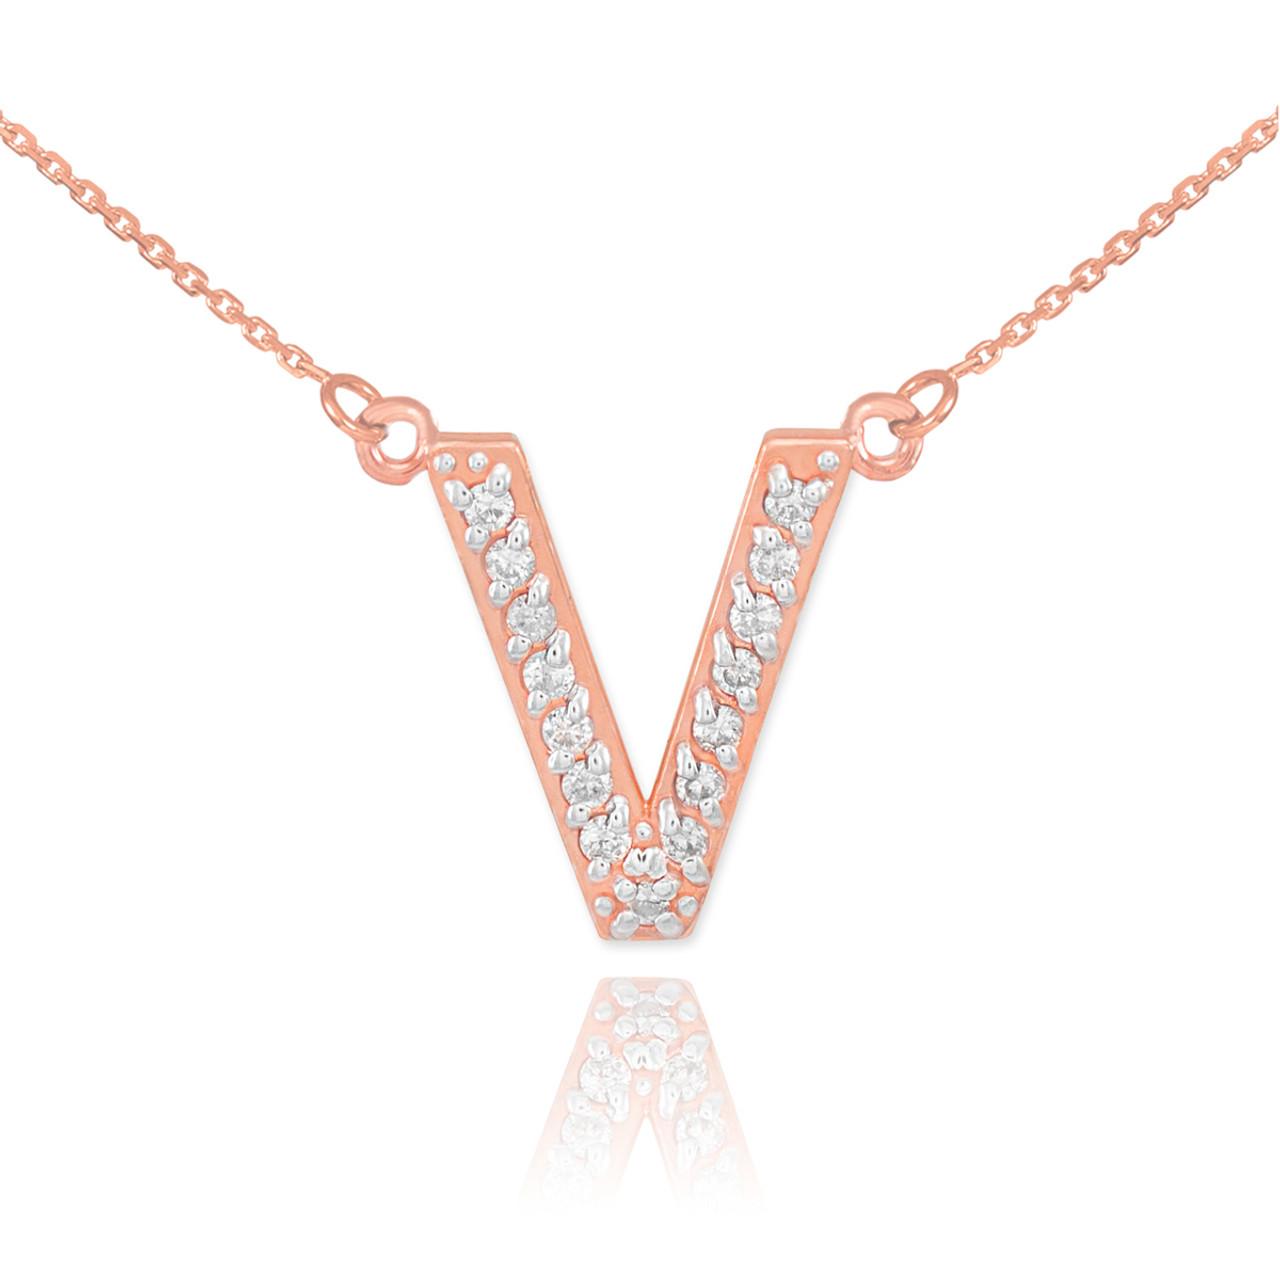 14k Rose Gold Letter V Diamond Initial Necklace